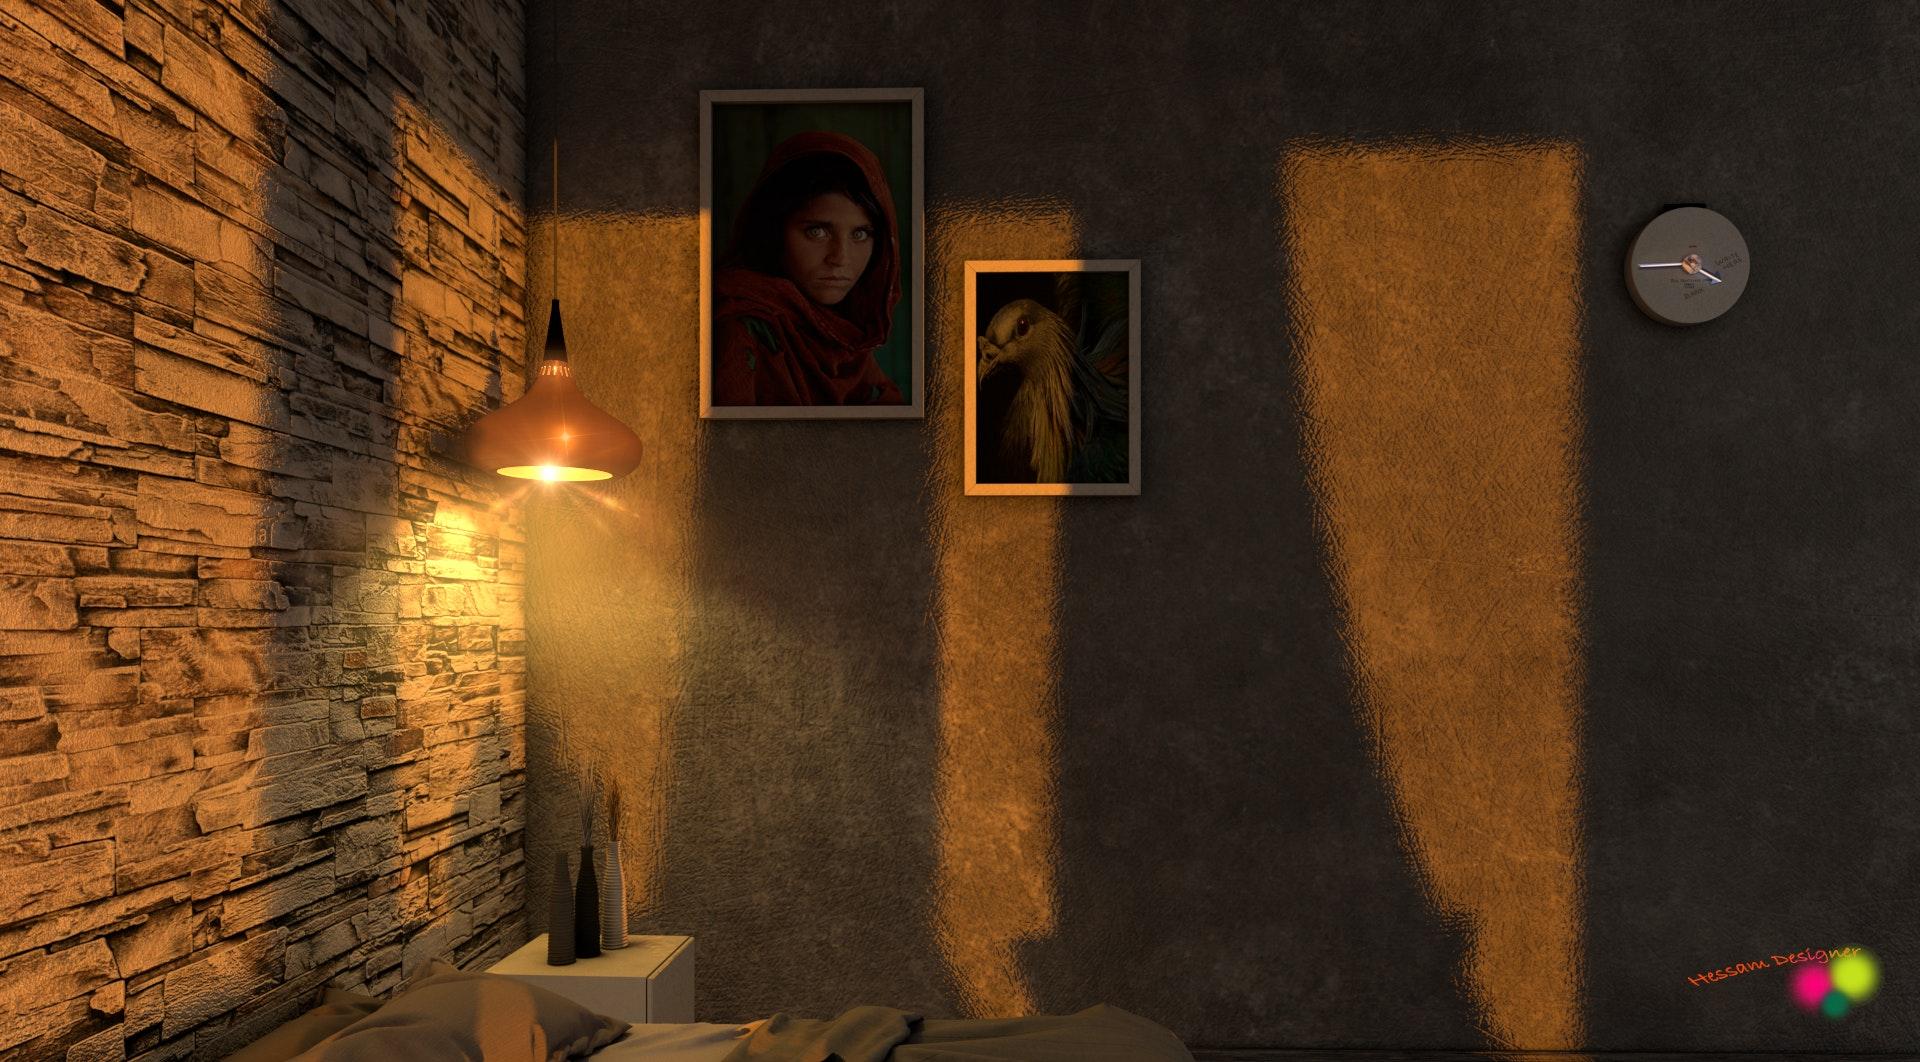 Design Furniture Bab Ezzouar free stock photo from hessam · pexels